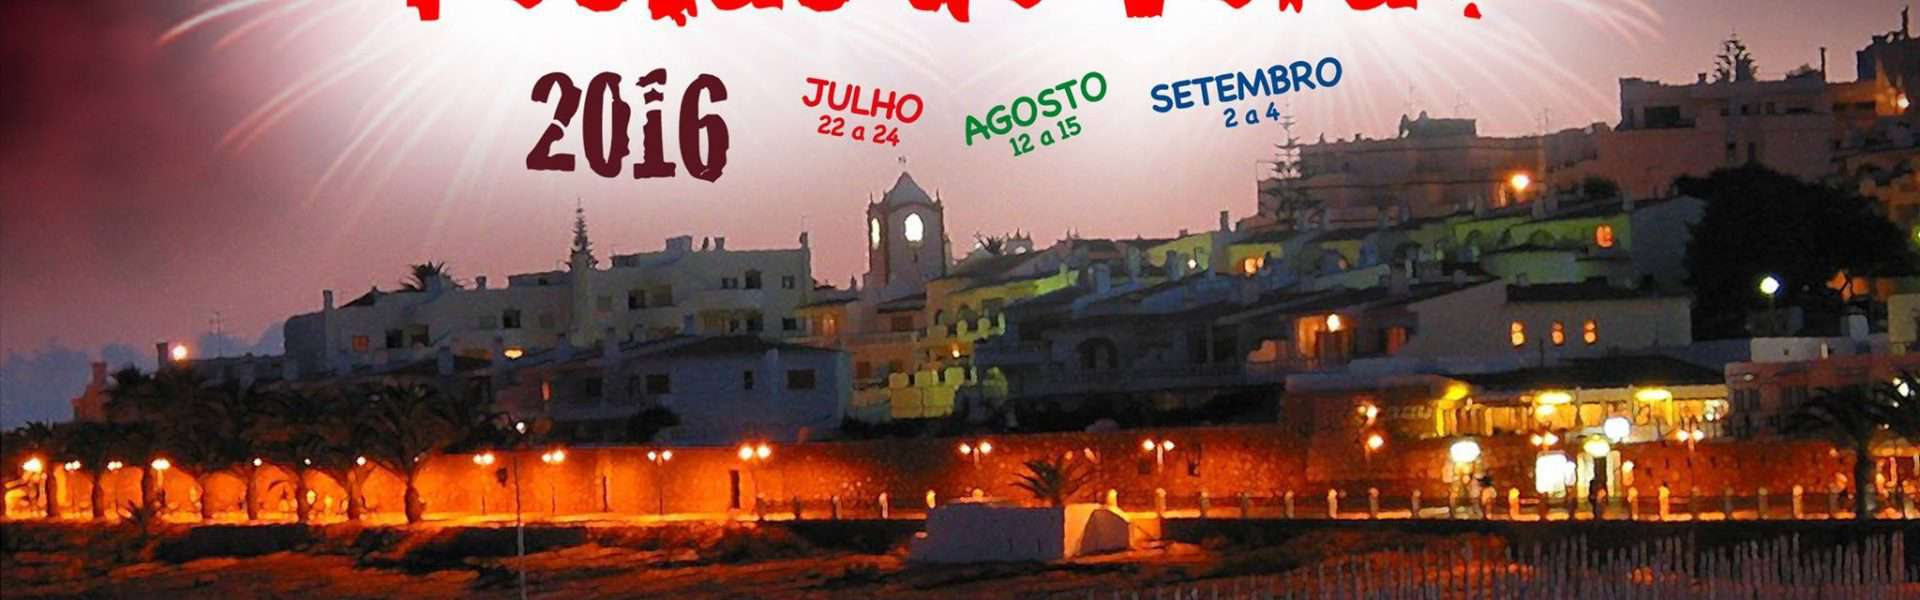 Praia-da-Luz-Summer-Parties